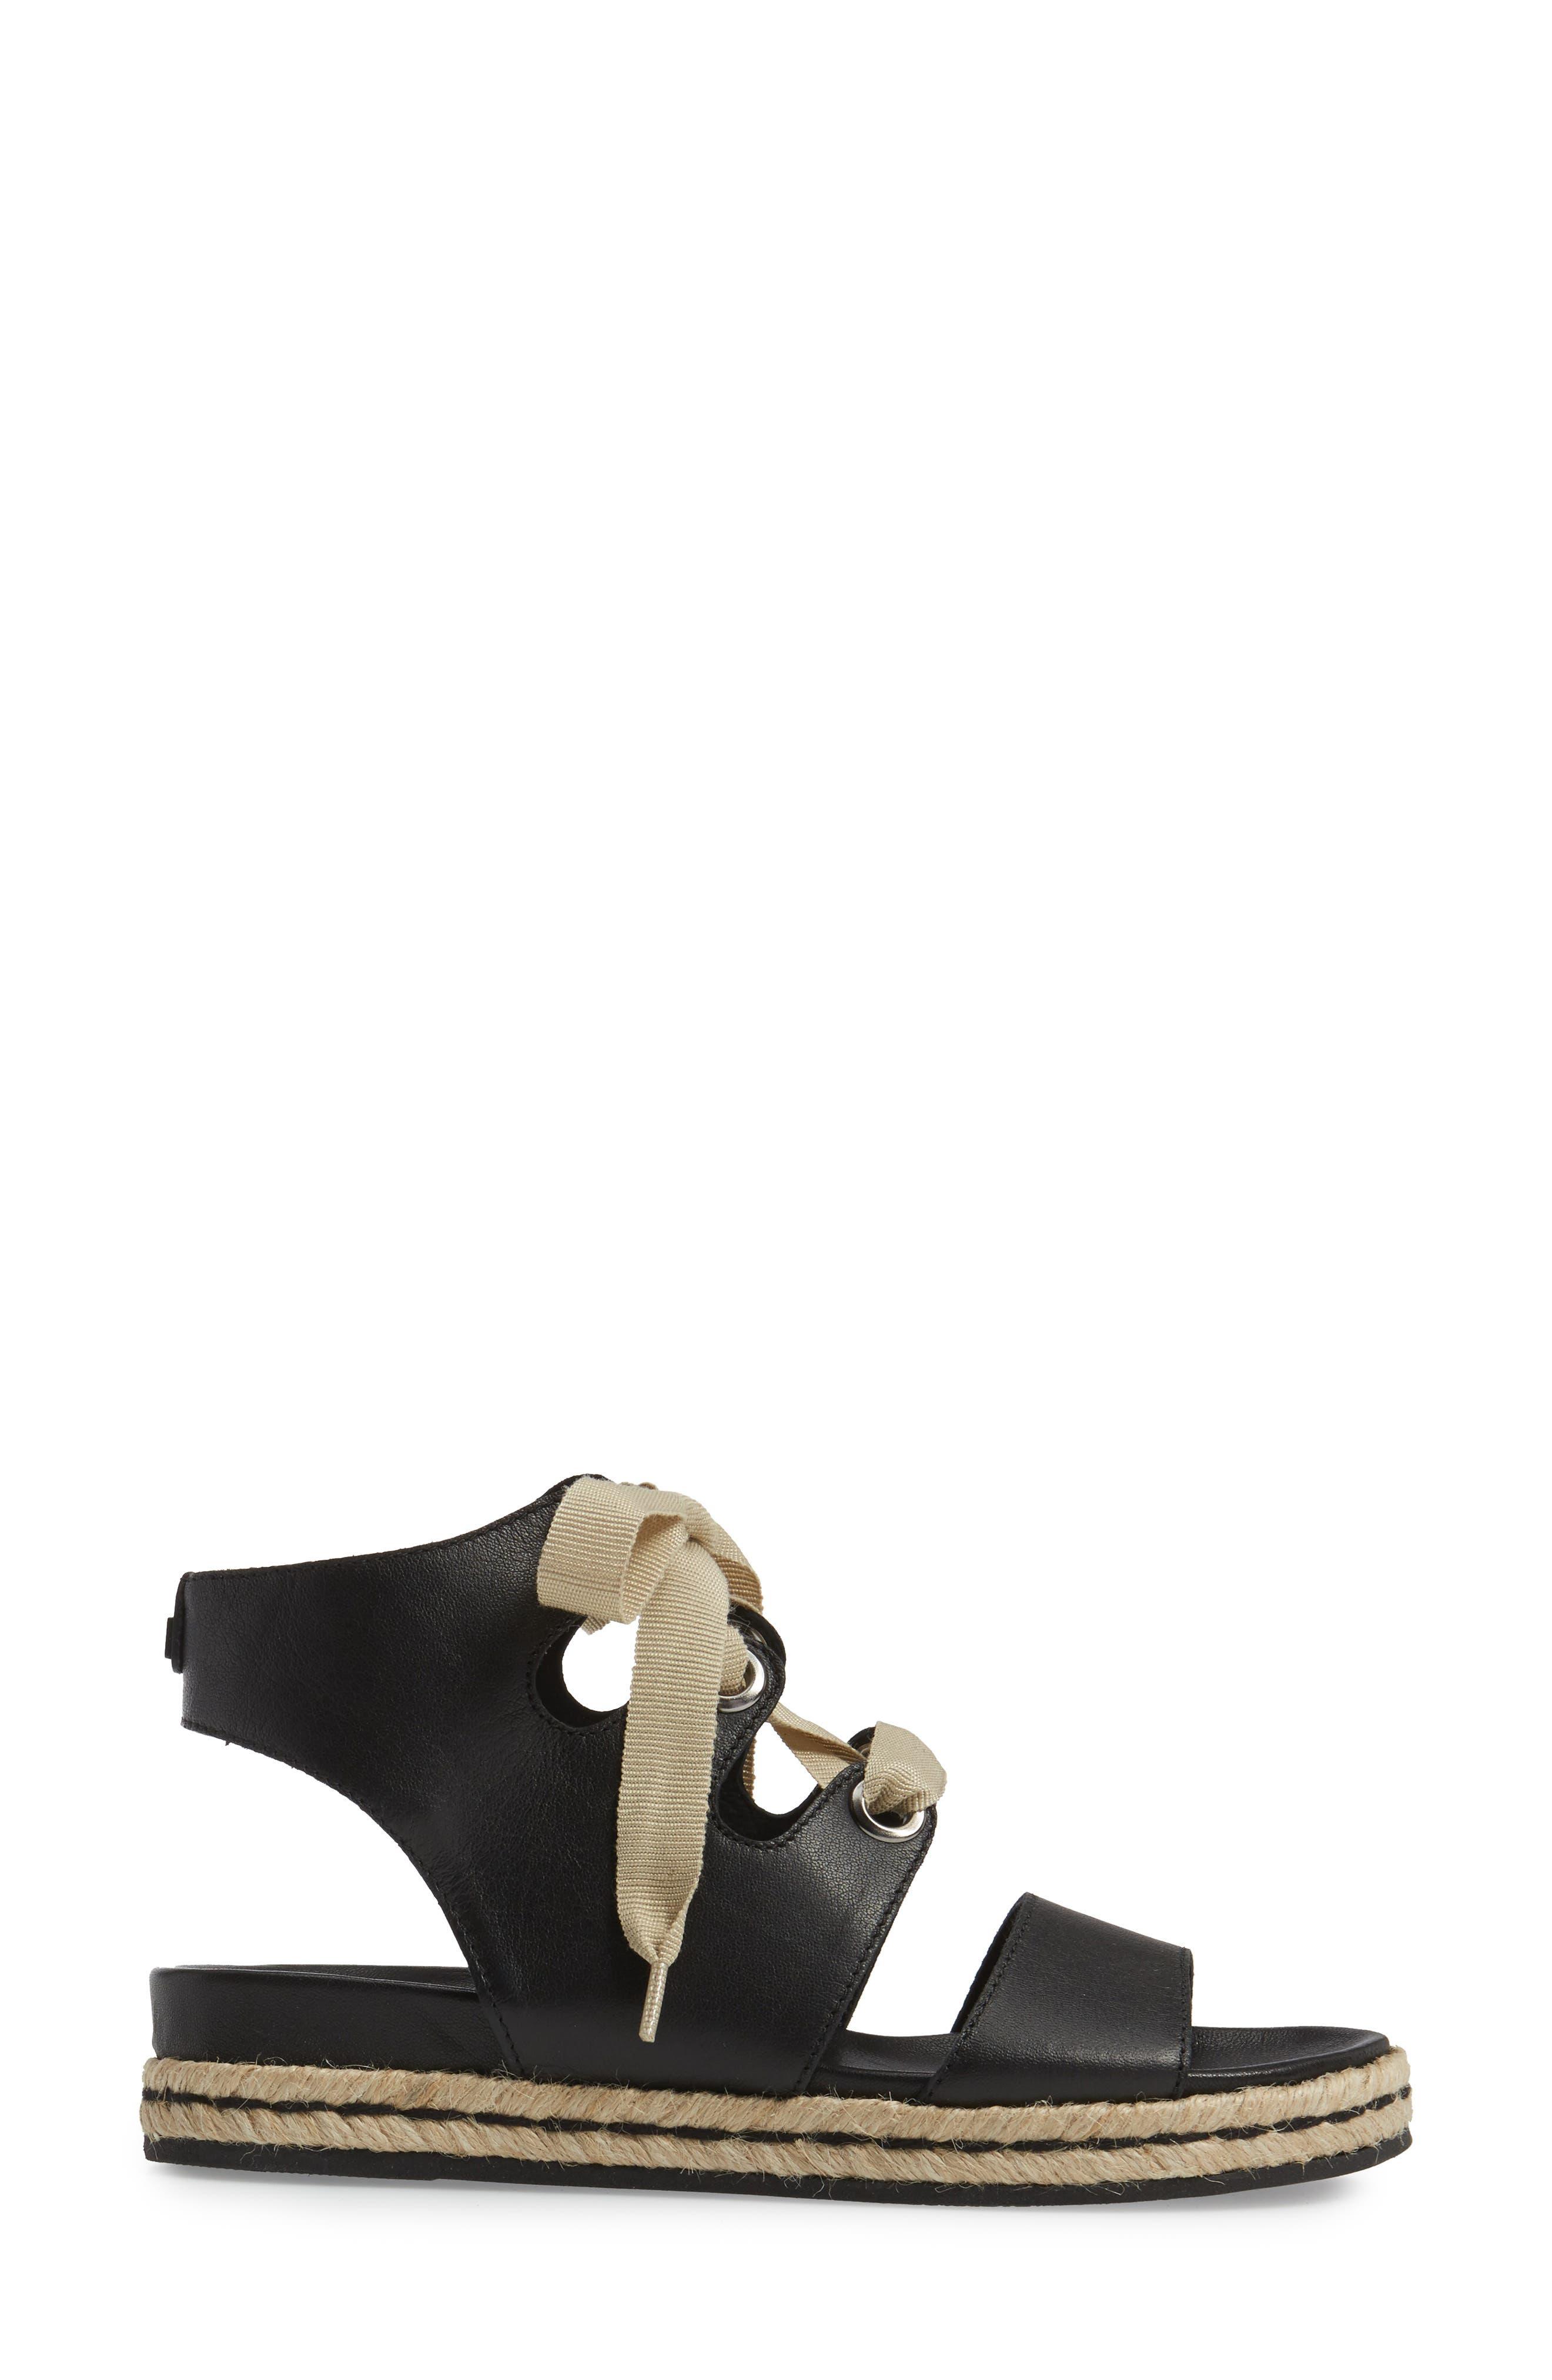 Baptista Lace-Up Sandal,                             Alternate thumbnail 3, color,                             001